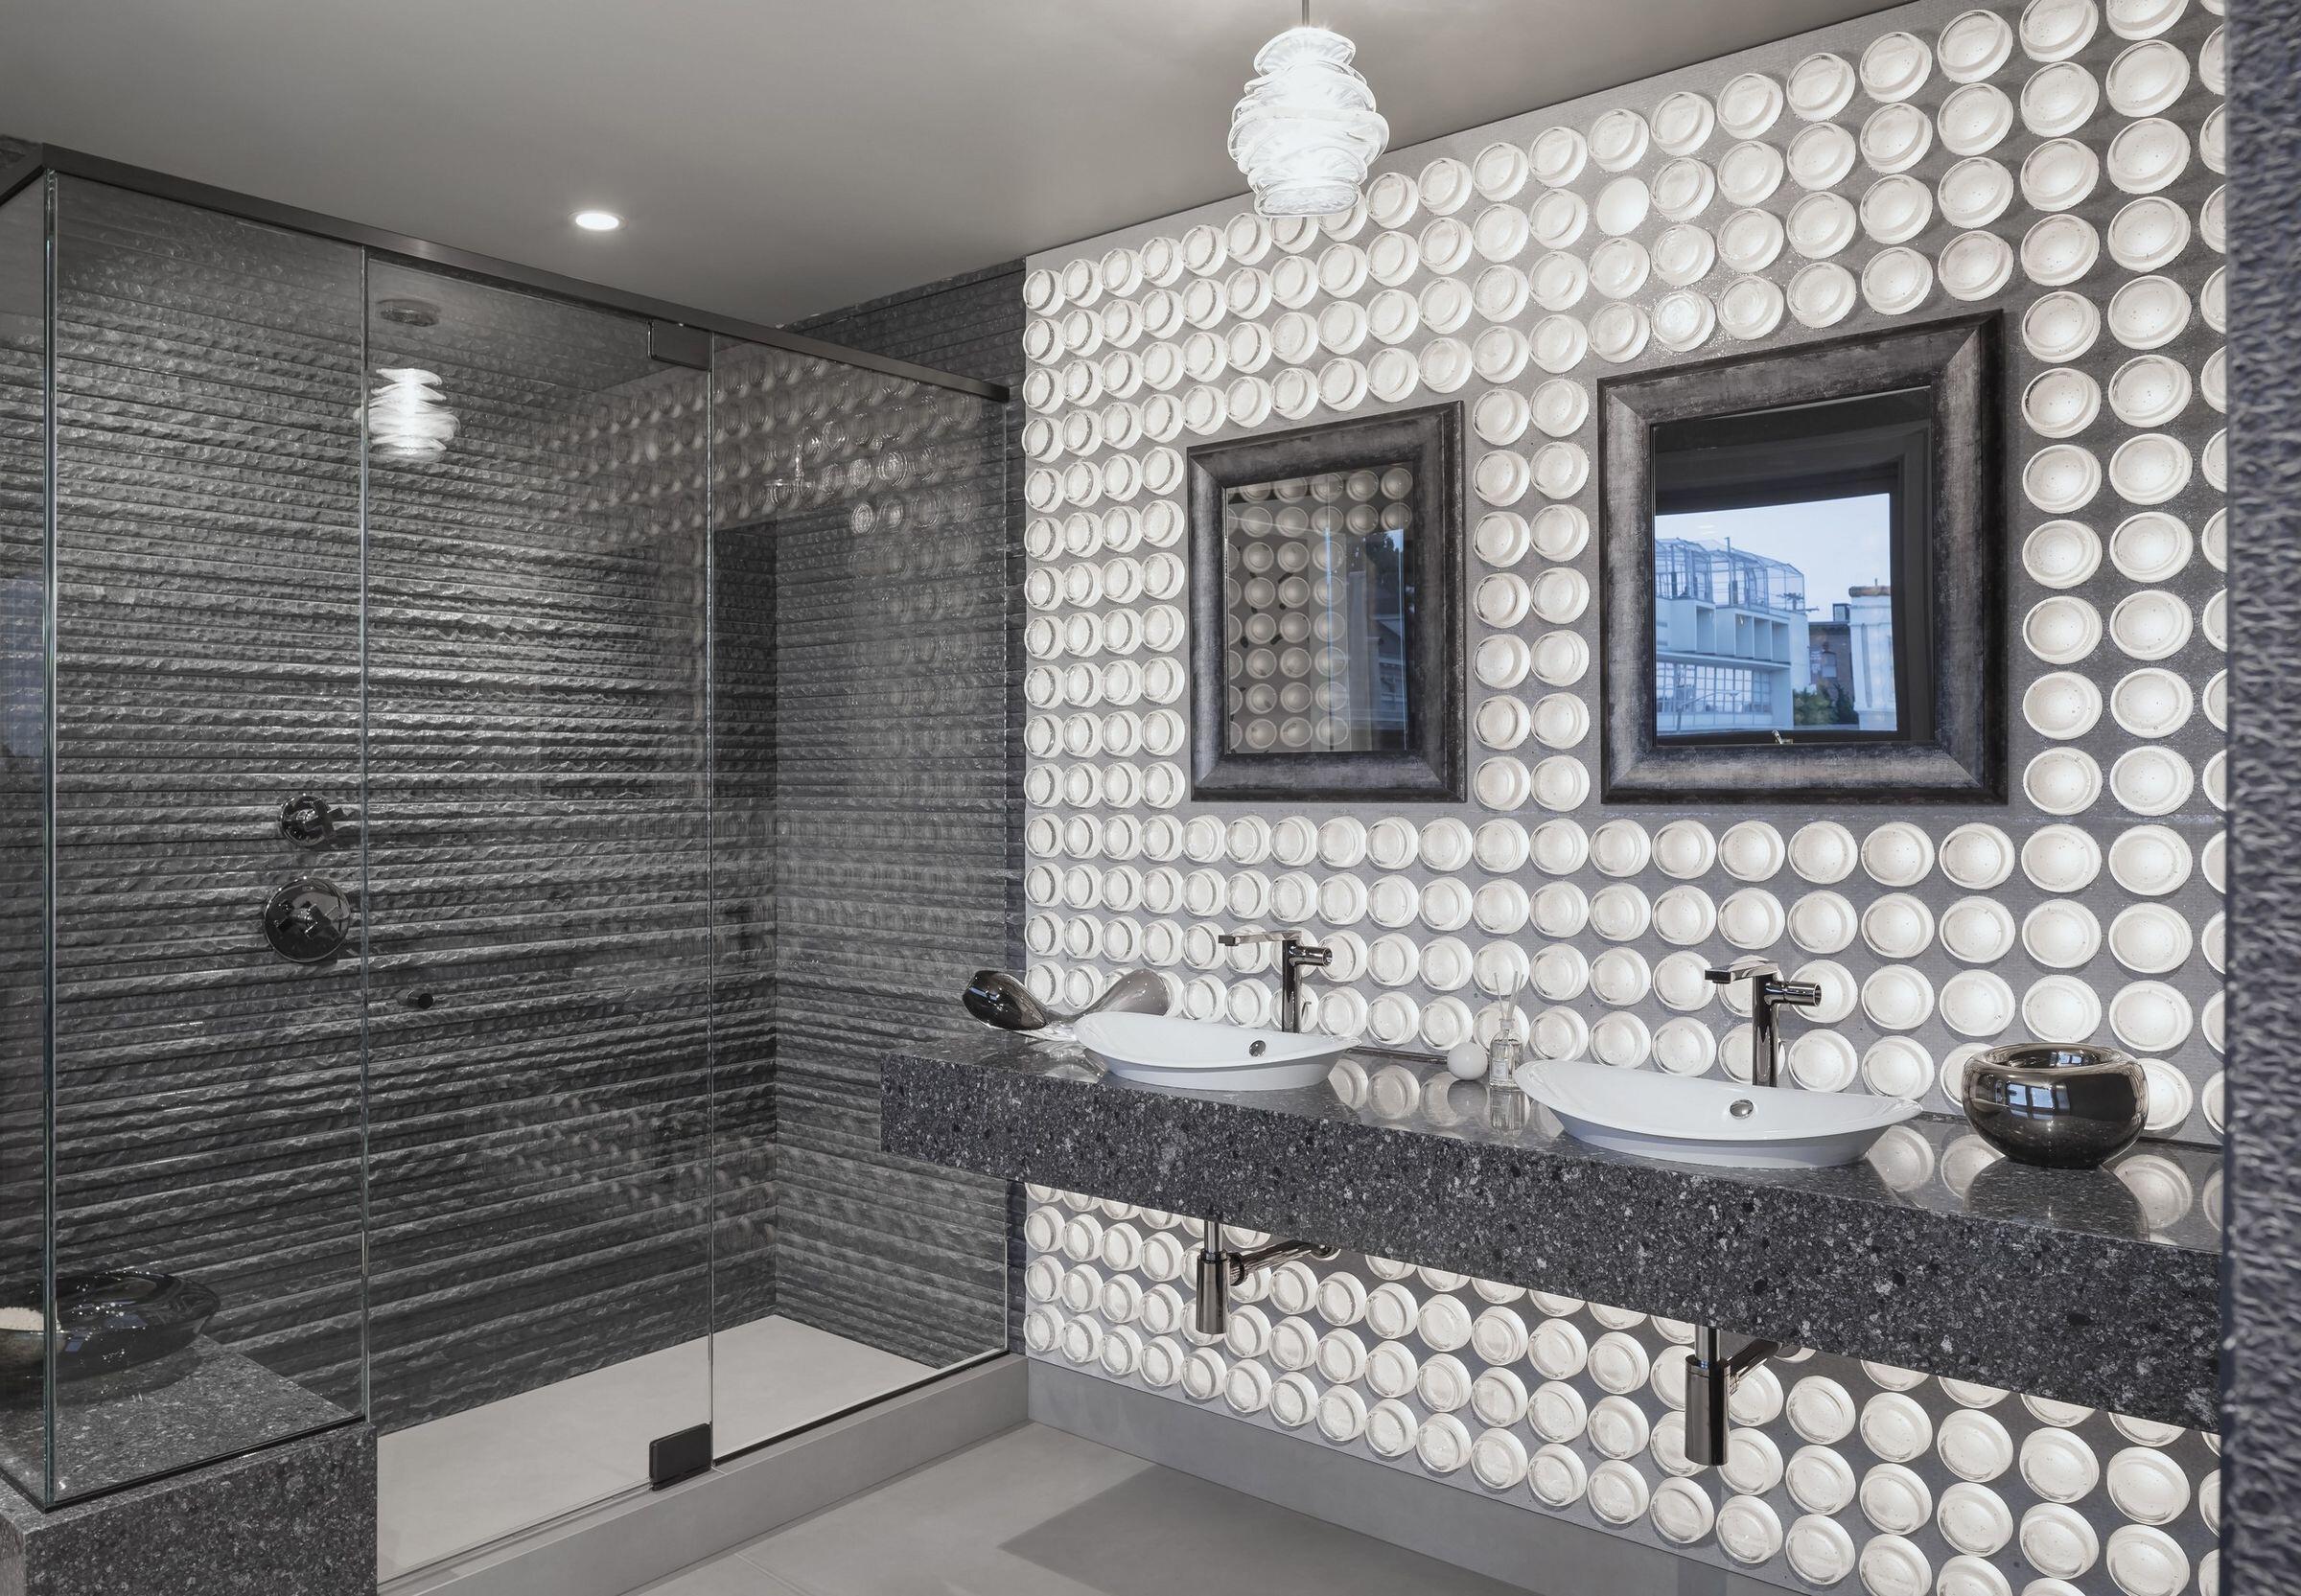 A Thousand Watt Bathroom